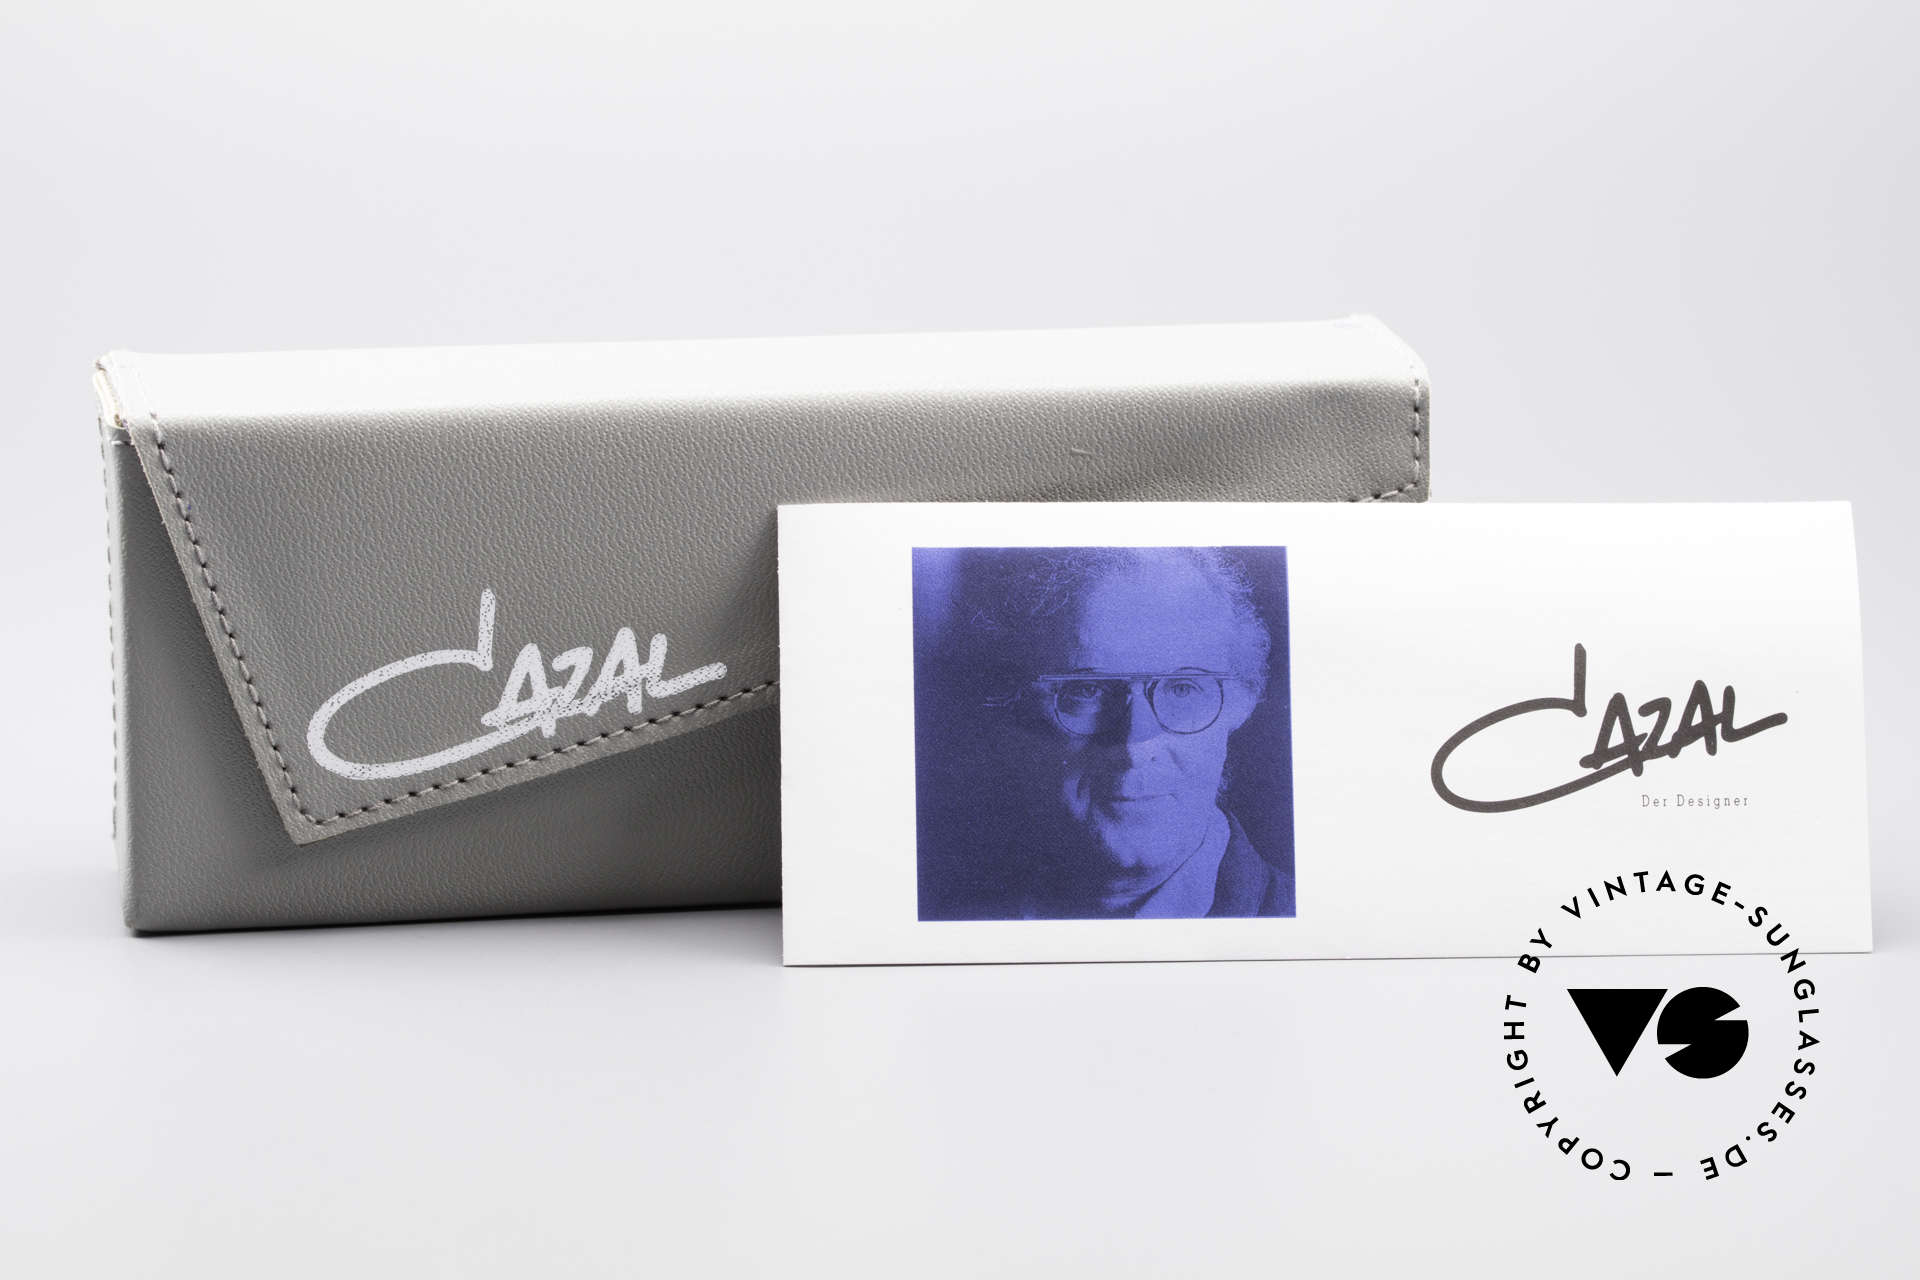 Cazal 648 True 90's Cari Zalloni Glasses, NO RETRO EYEWEAR, but a 28 years old ORIGINAL!, Made for Men and Women